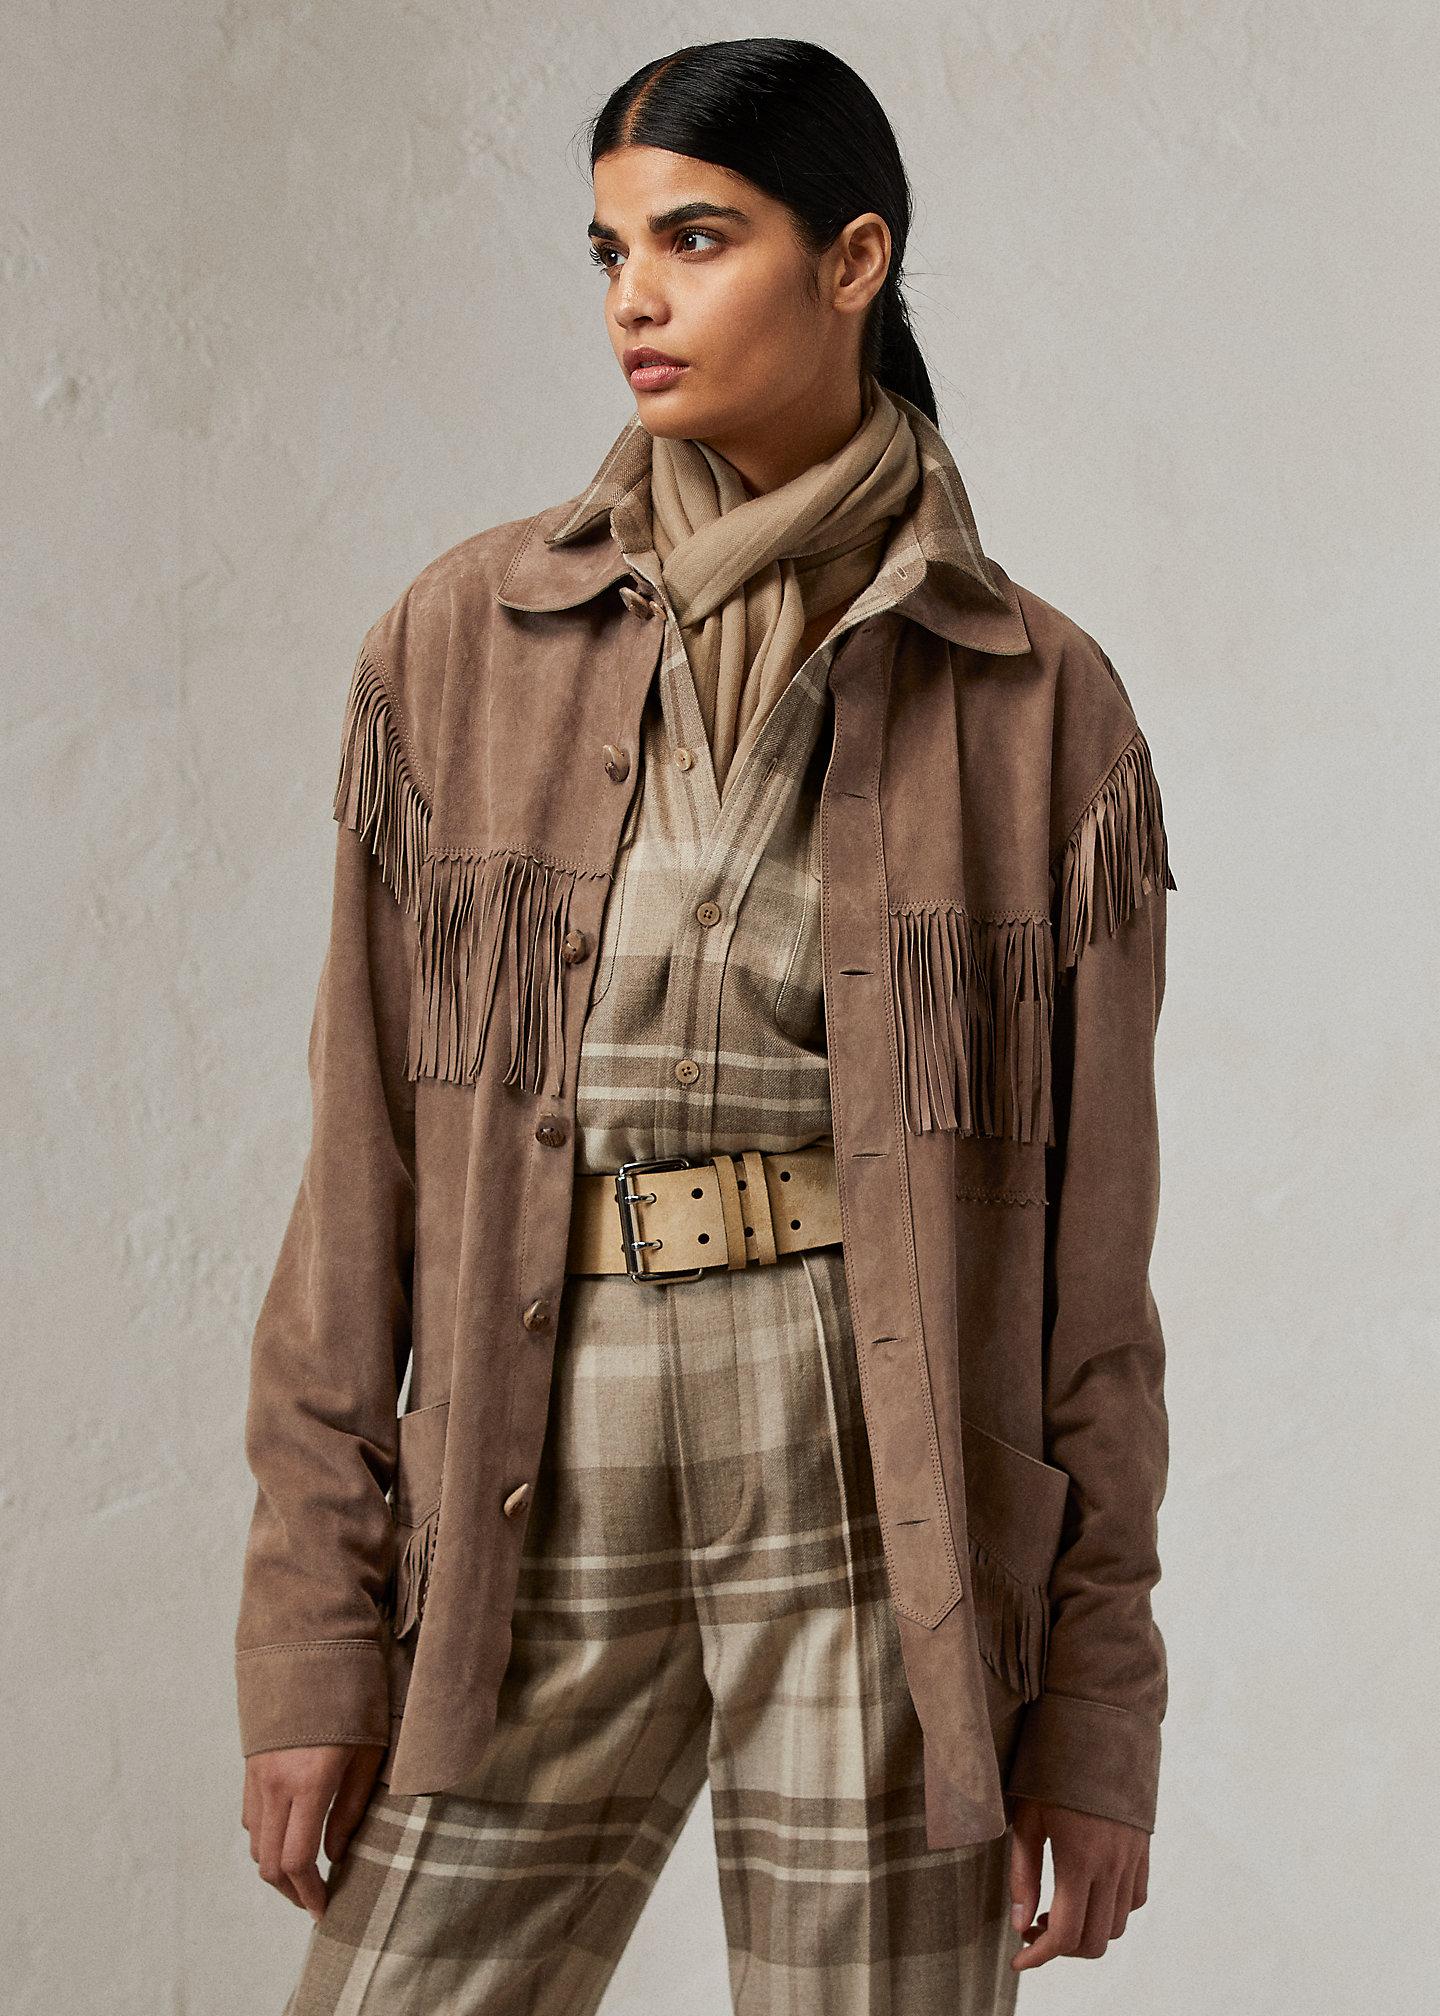 Ralph Lauren Collection Dasha Lamb-Suede Shirt Jacket 1